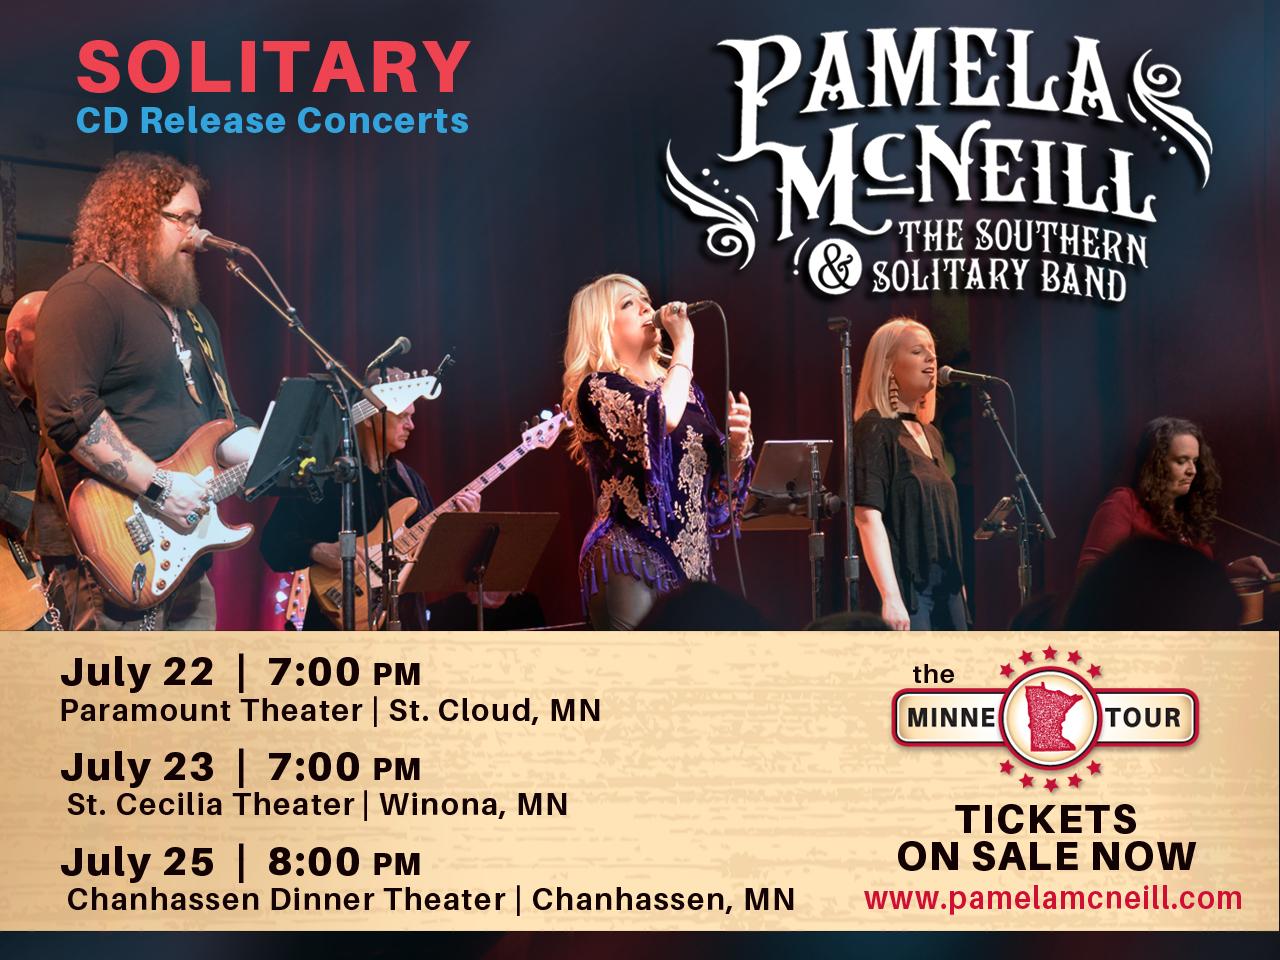 Pamela_CDrelease dates_MINNETOUR_Final.jpg